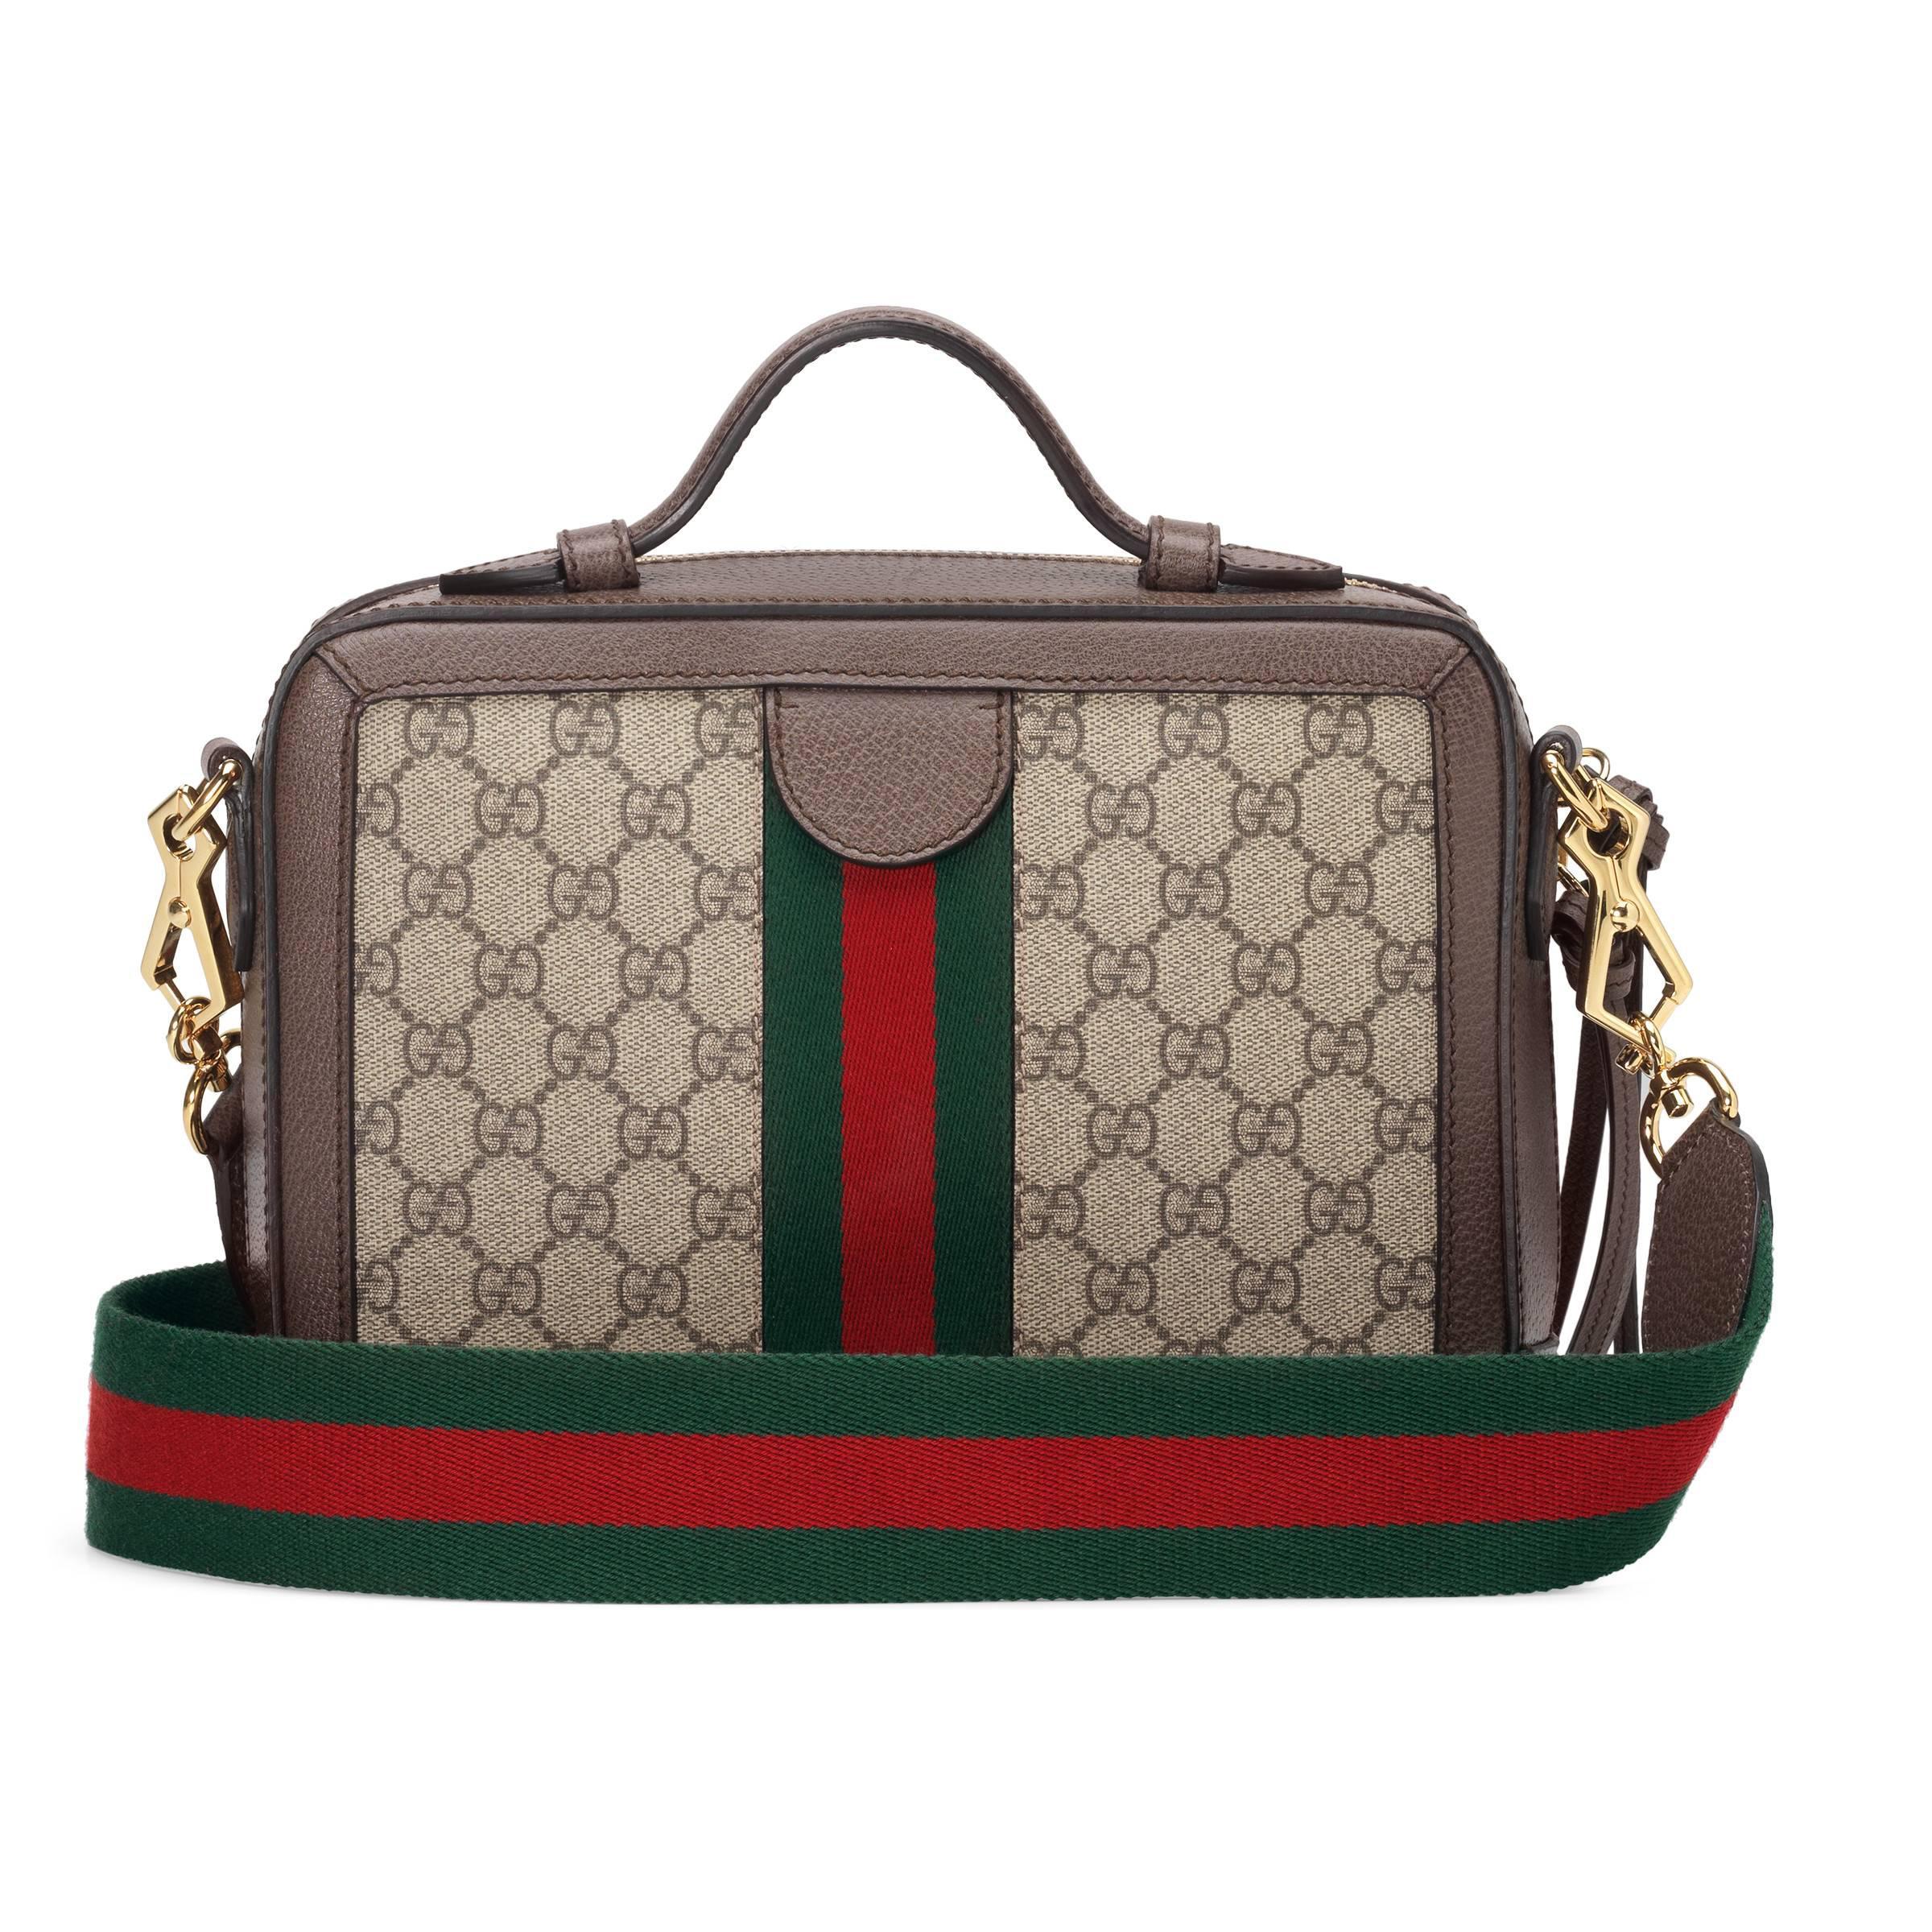 0262ec4bcfc Gucci Ophidia Small GG Shoulder Bag - Lyst